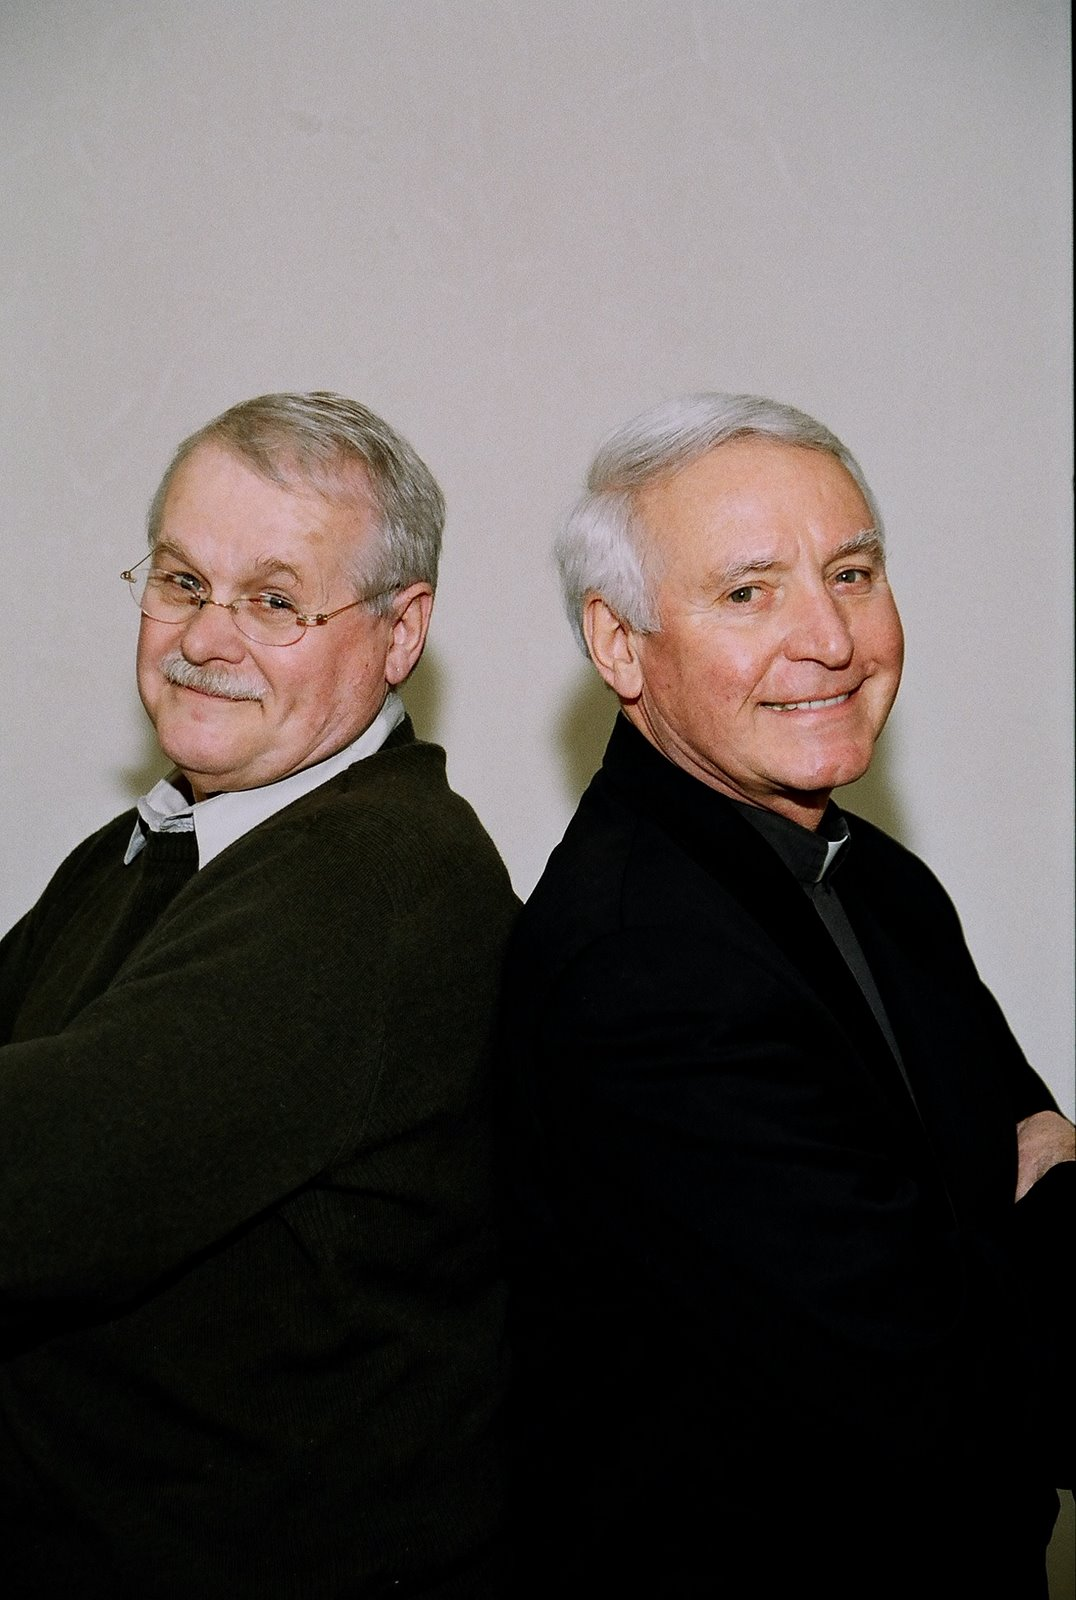 [Larry,+John,+back+to+back]